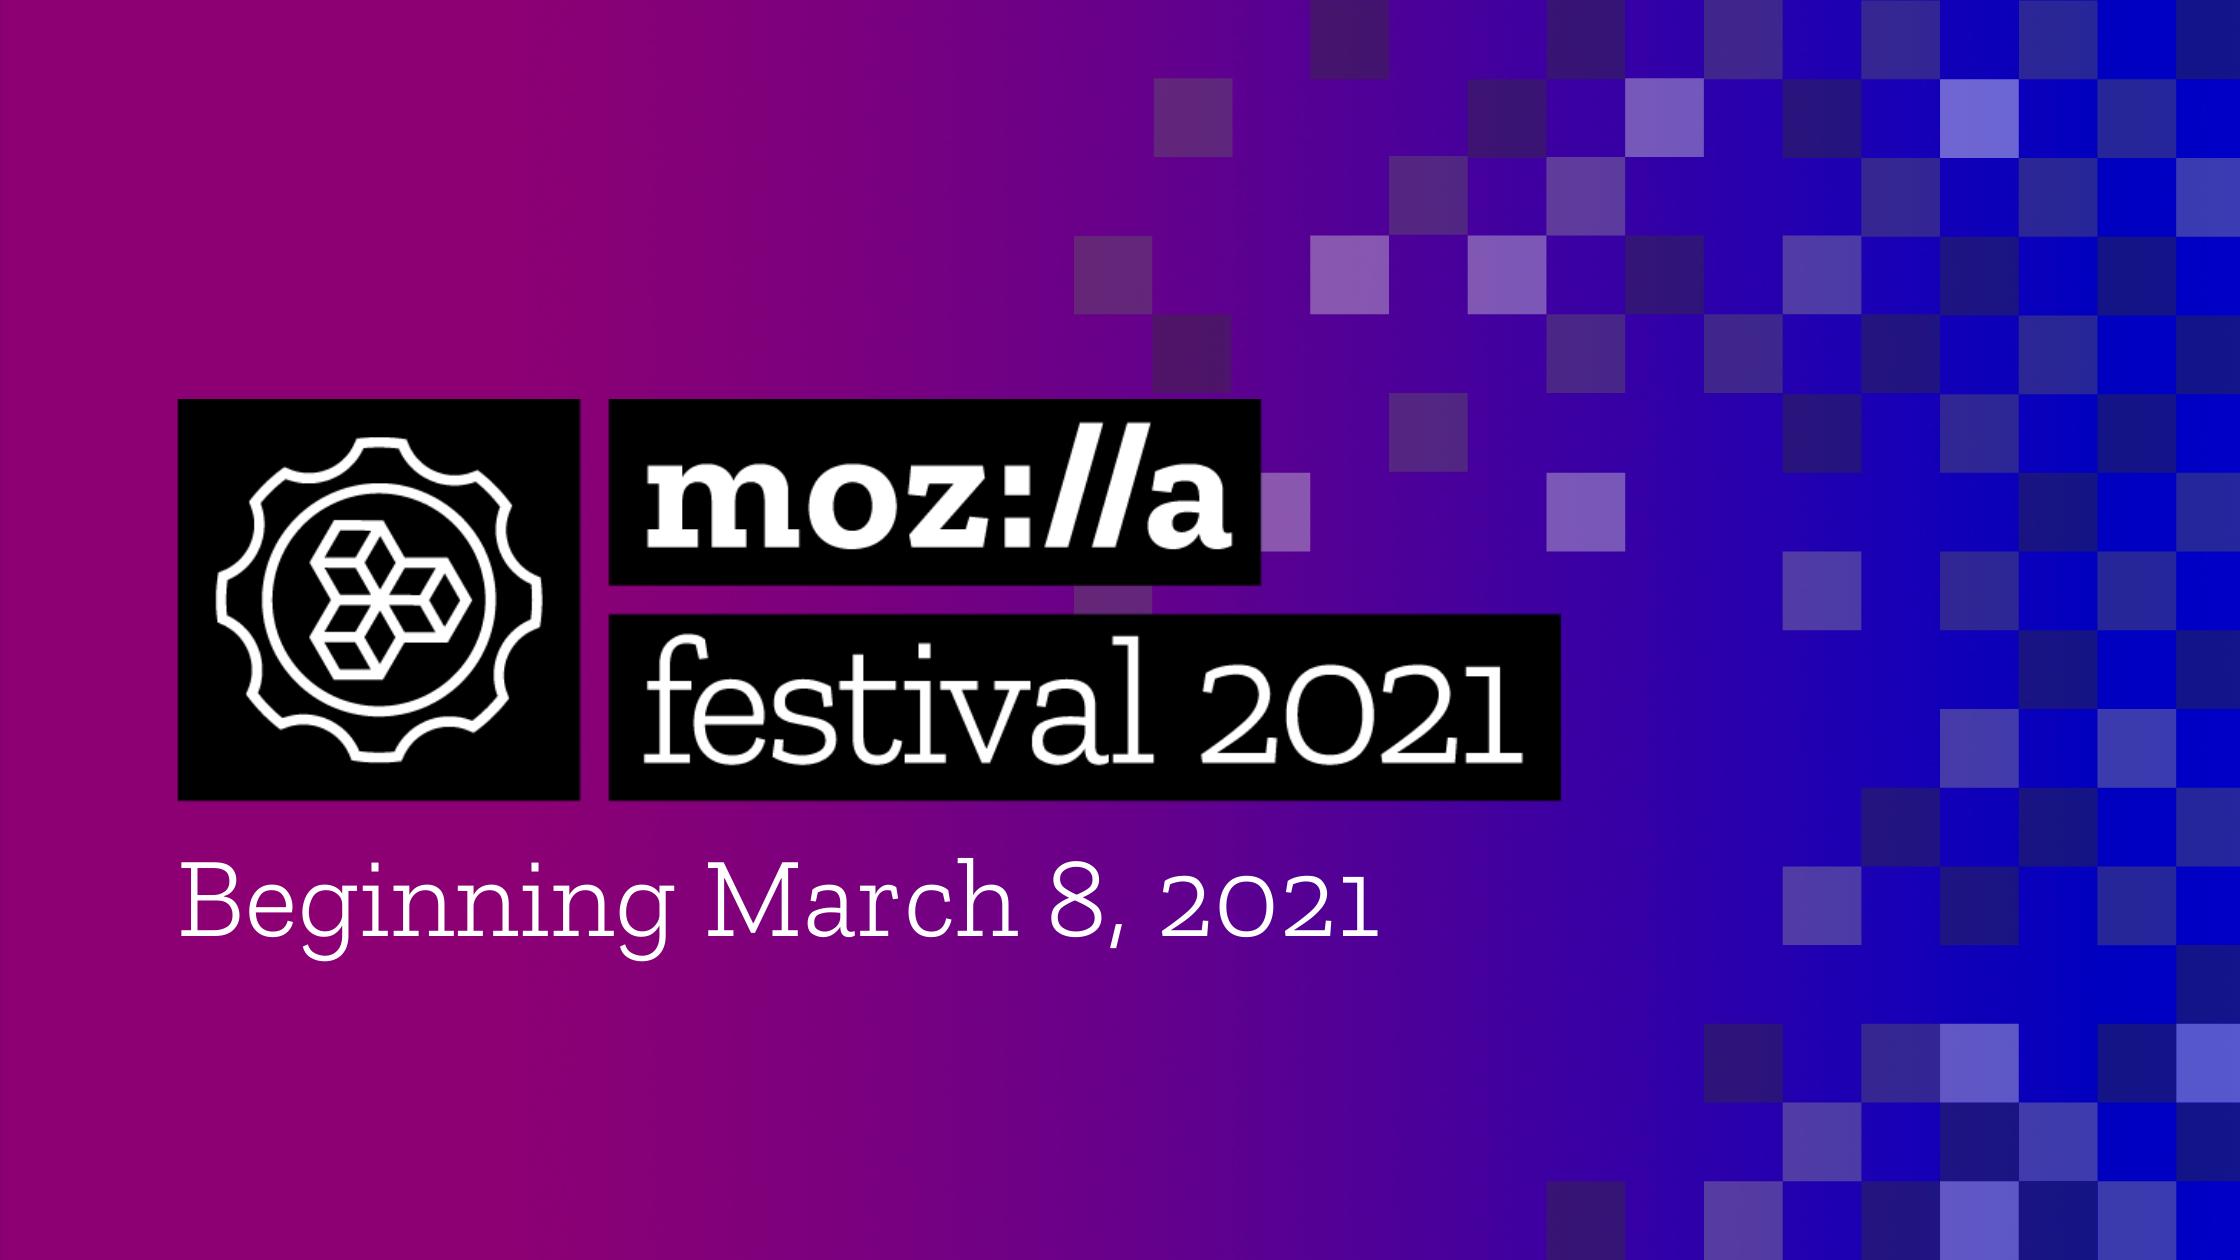 MozFest 2021